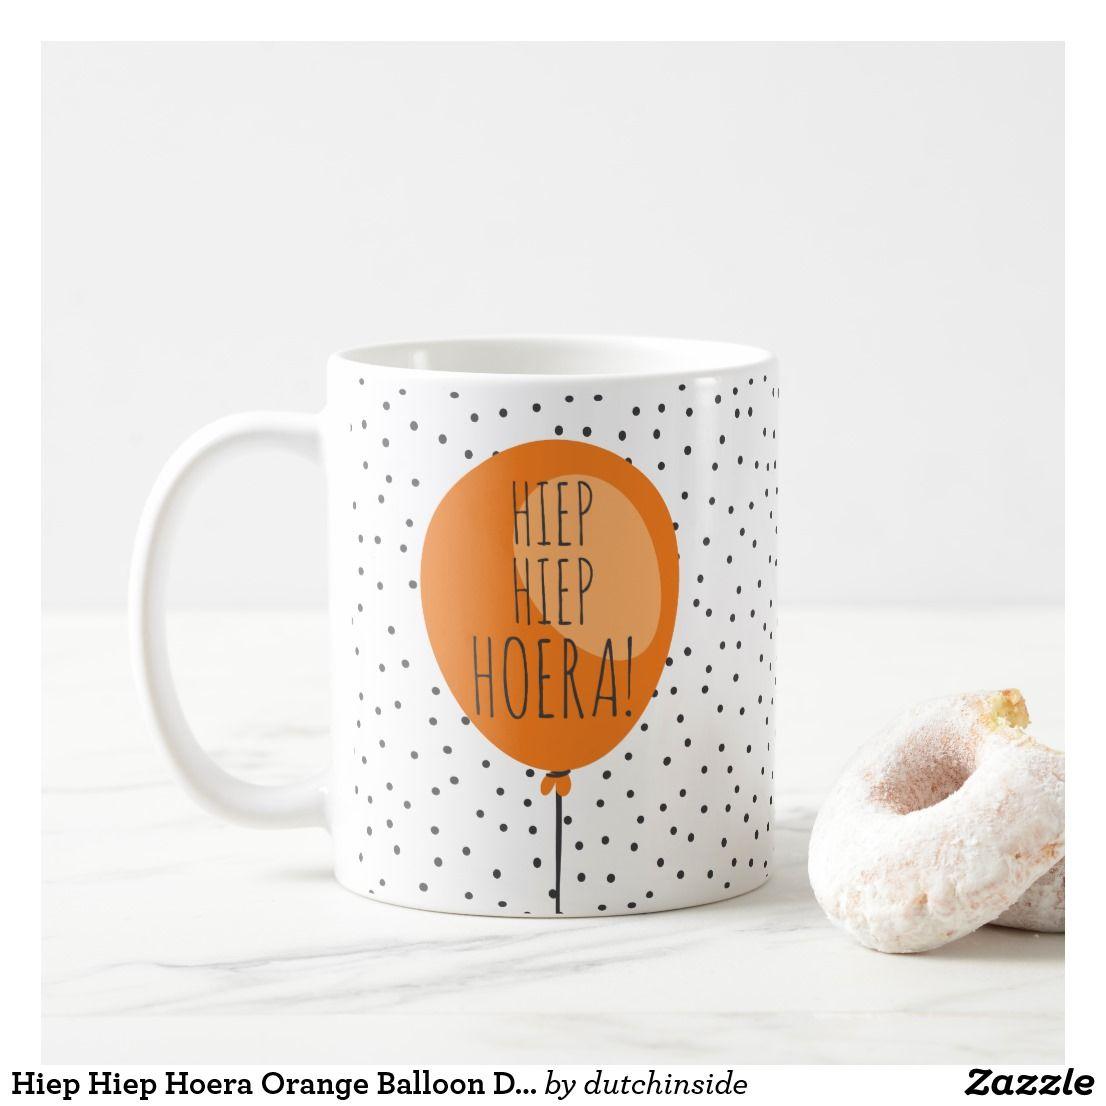 Hiep Hiep Hoera Orange Balloon Dutch Birthday Gift Coffee